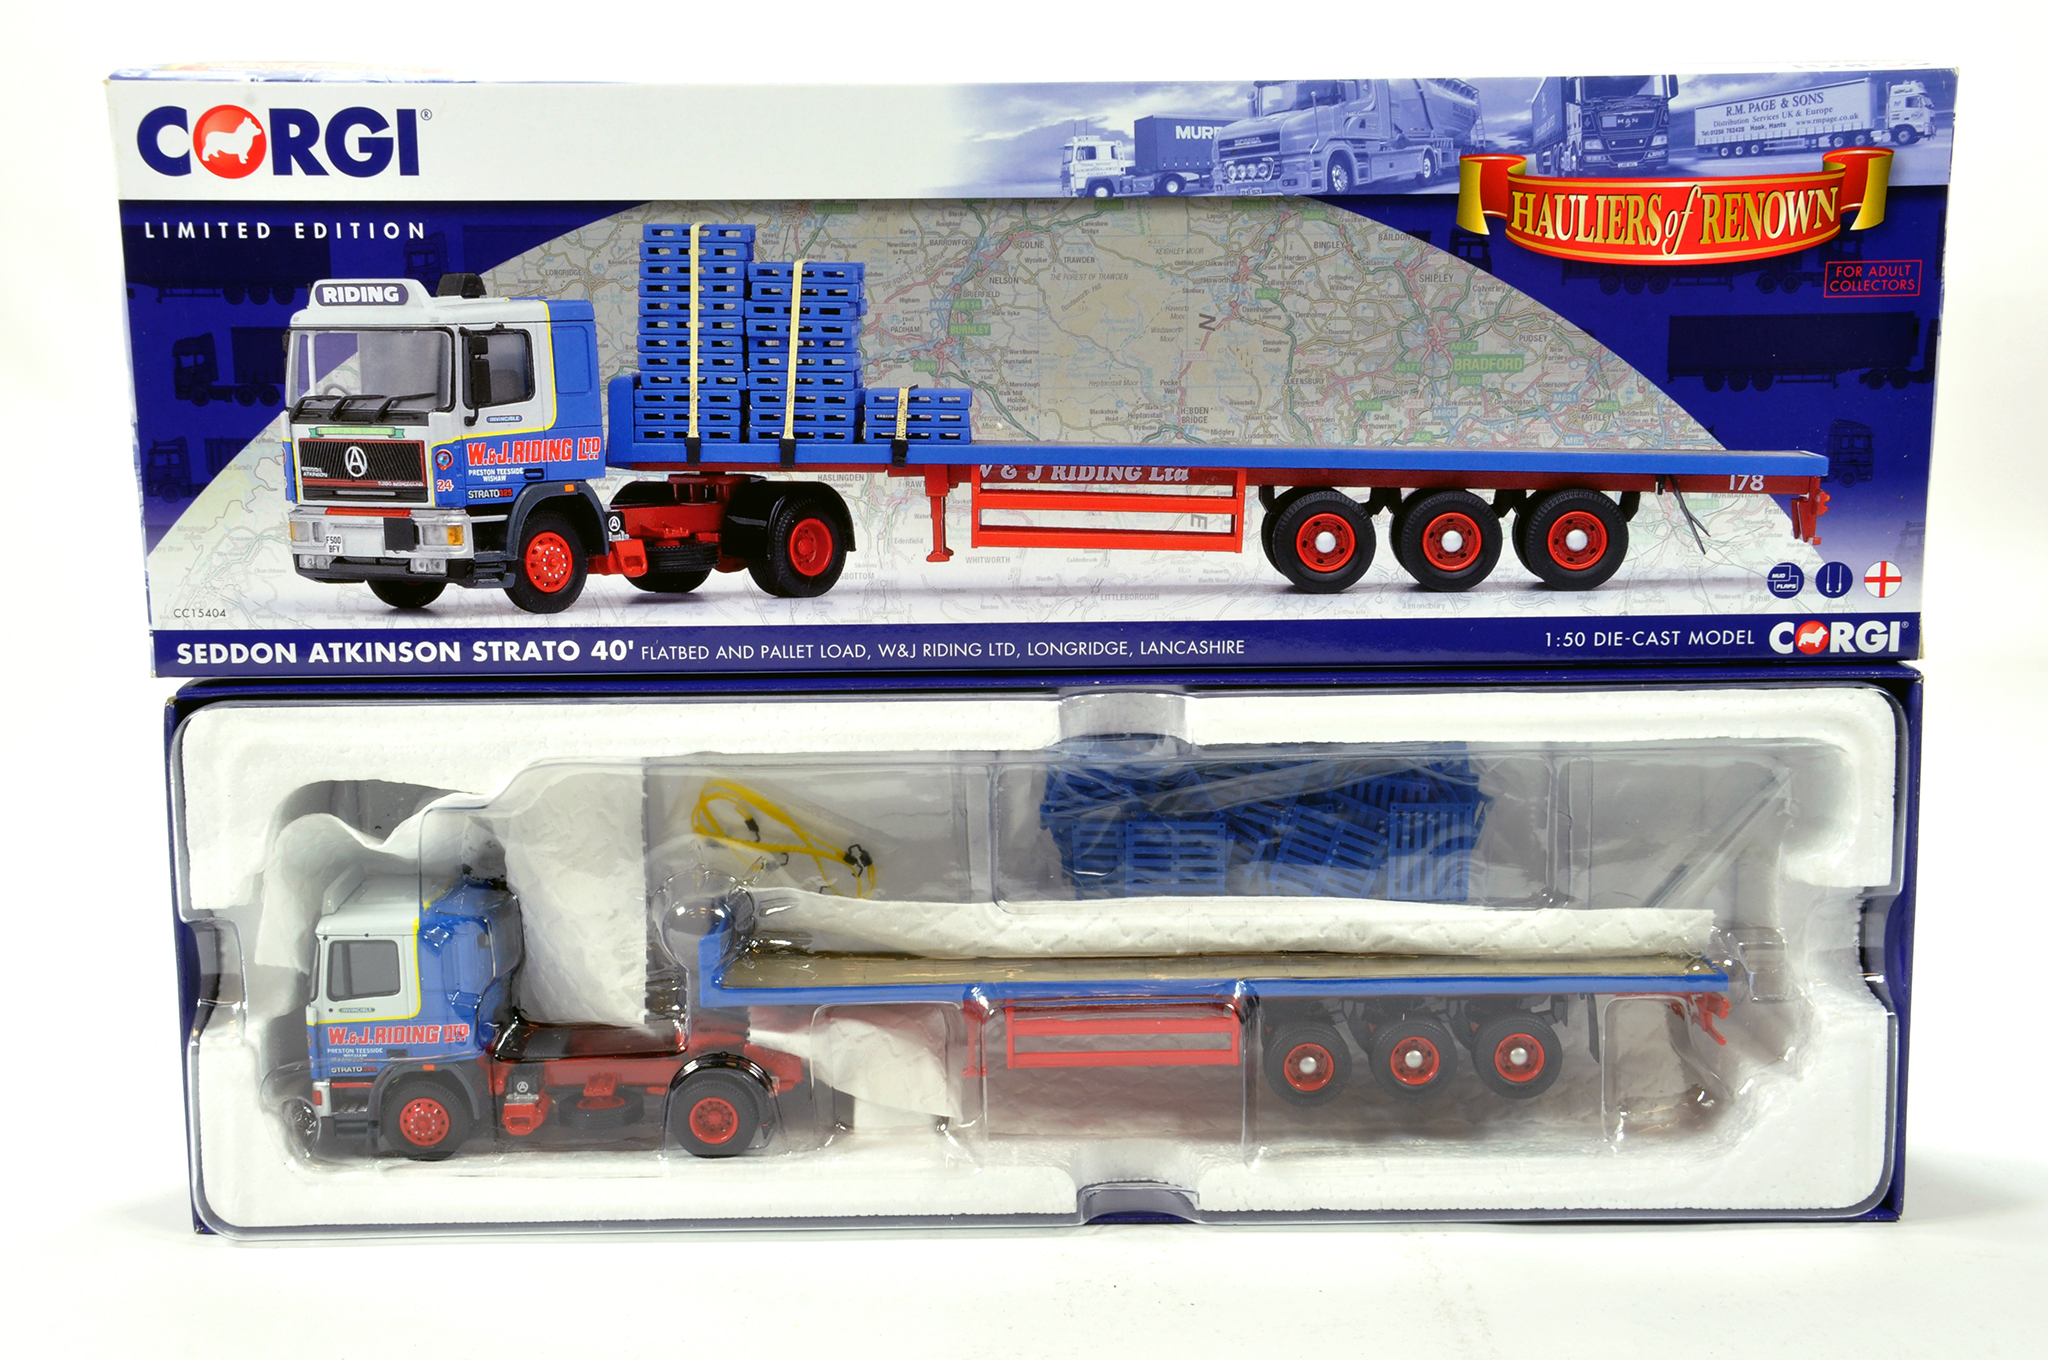 Lot 49 - Corgi 1/50 diecast truck issue comprising No. CC15404 Seddon Atkinson Statro 40 Flatbed and Pallet